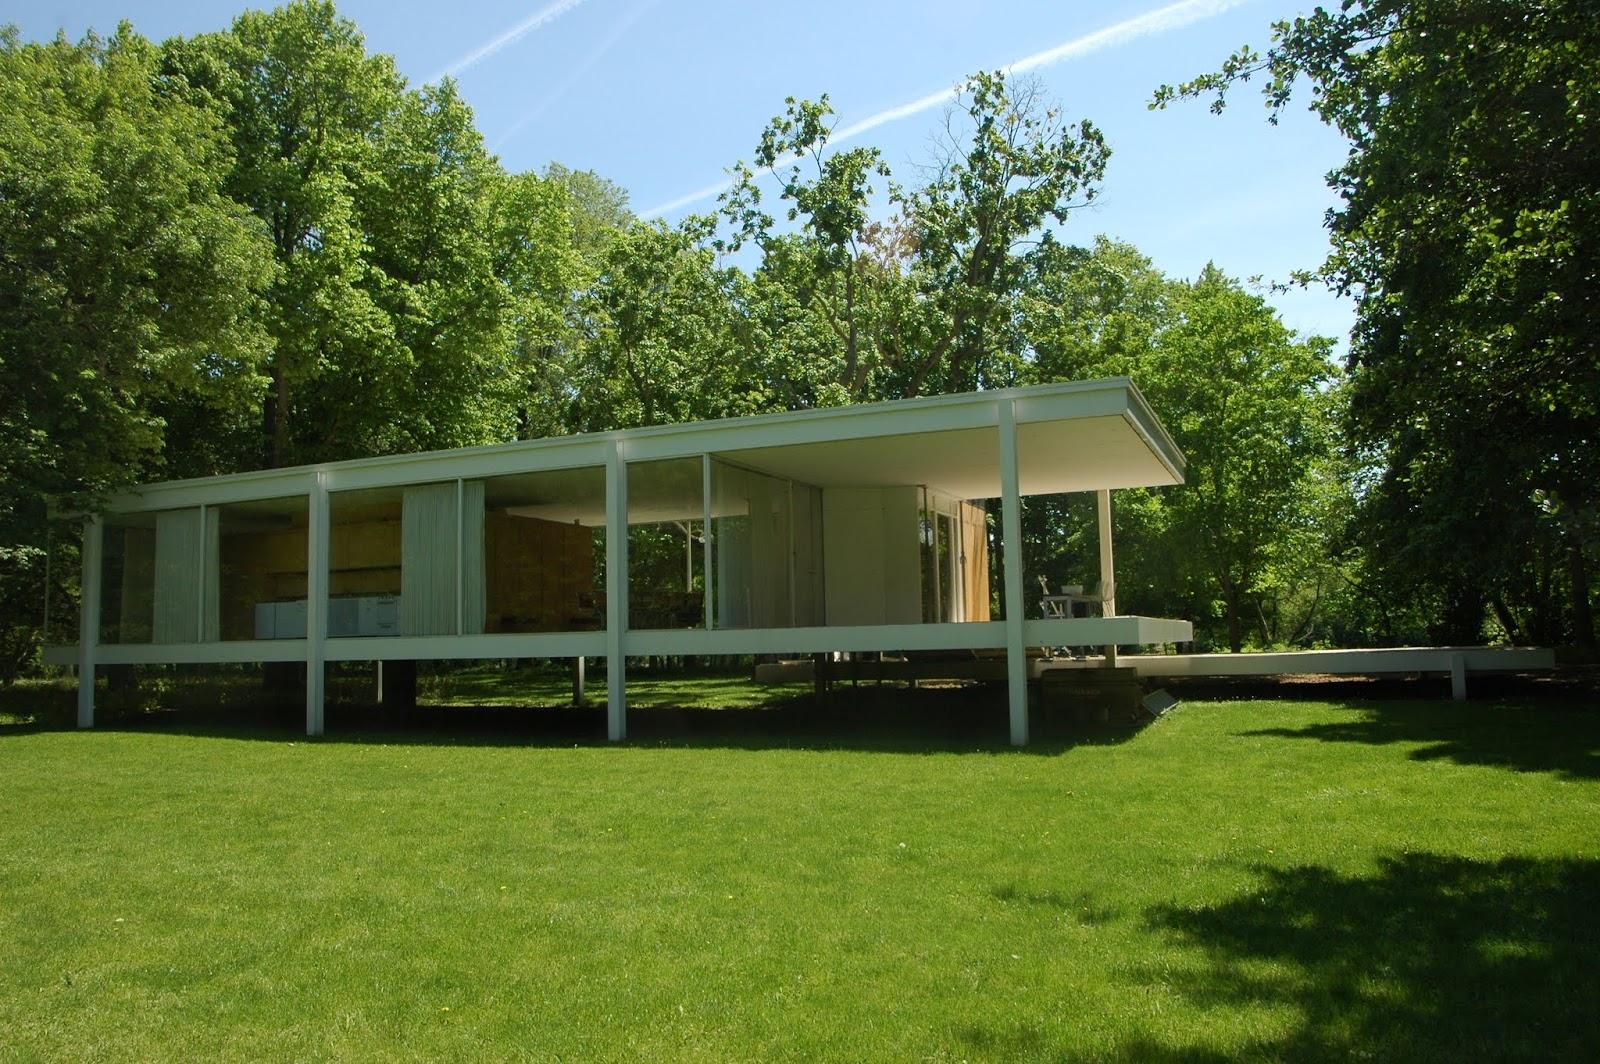 FARNSWORTH HOUSE | URBAN ARCHITECTURE NOW